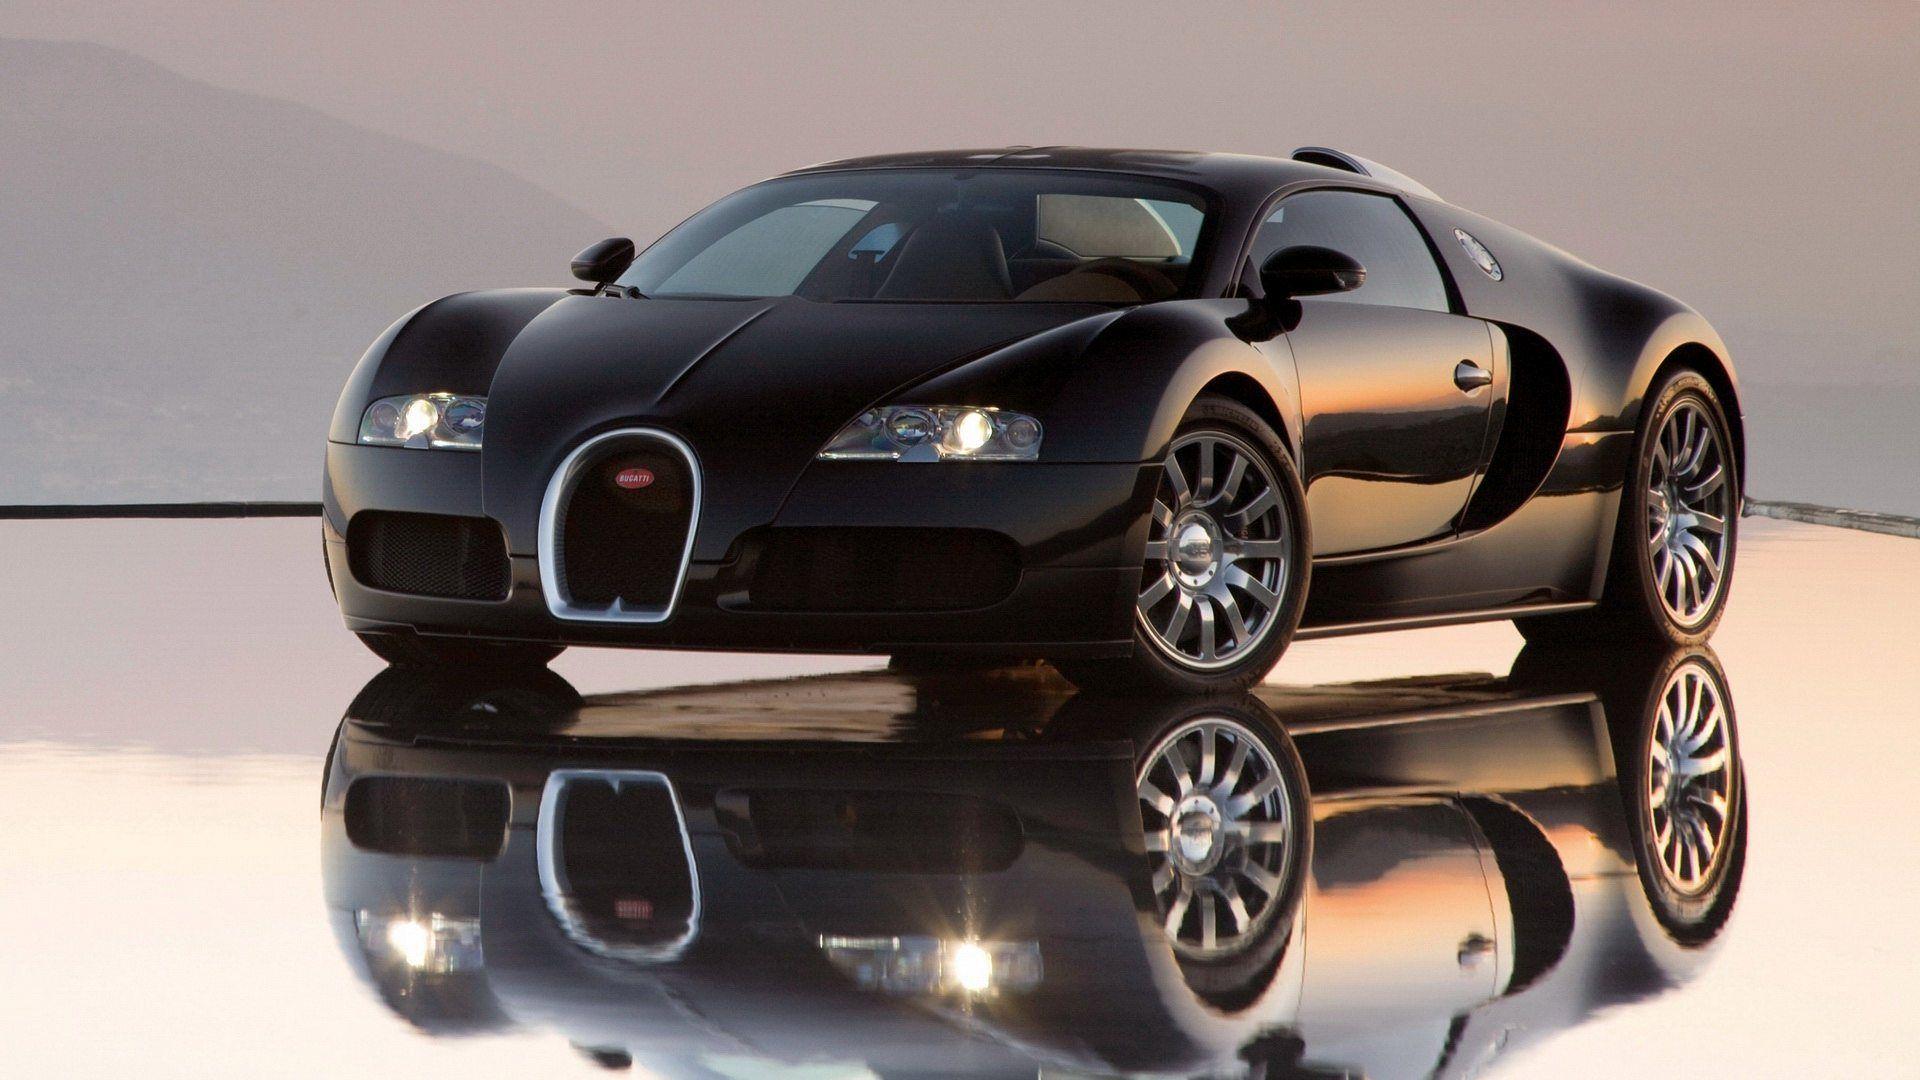 Bugatti Veyron Wallpaper Http Wallpapers And Backgrounds Net Bugatti Veyron Wallpaper Bugatti Veyron Bugatti Cars Bugatti Eb110